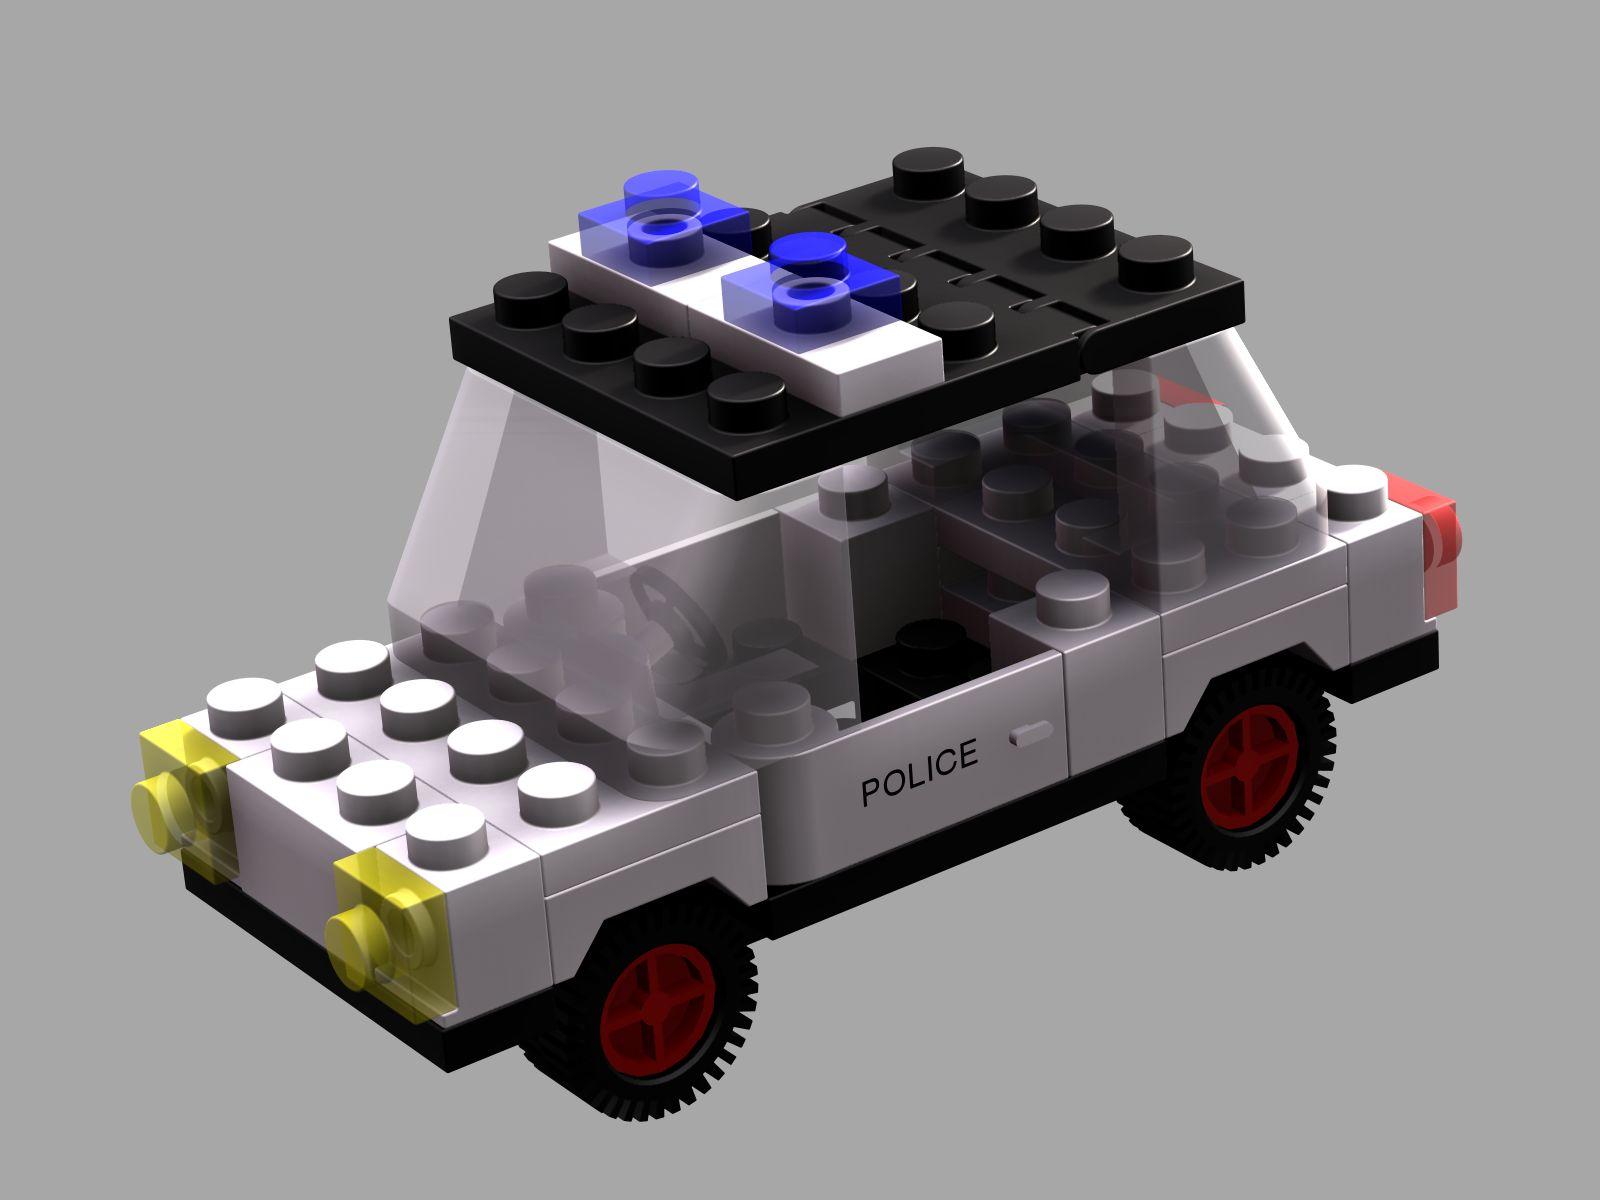 Lego Police Car by neilwightman on deviantART